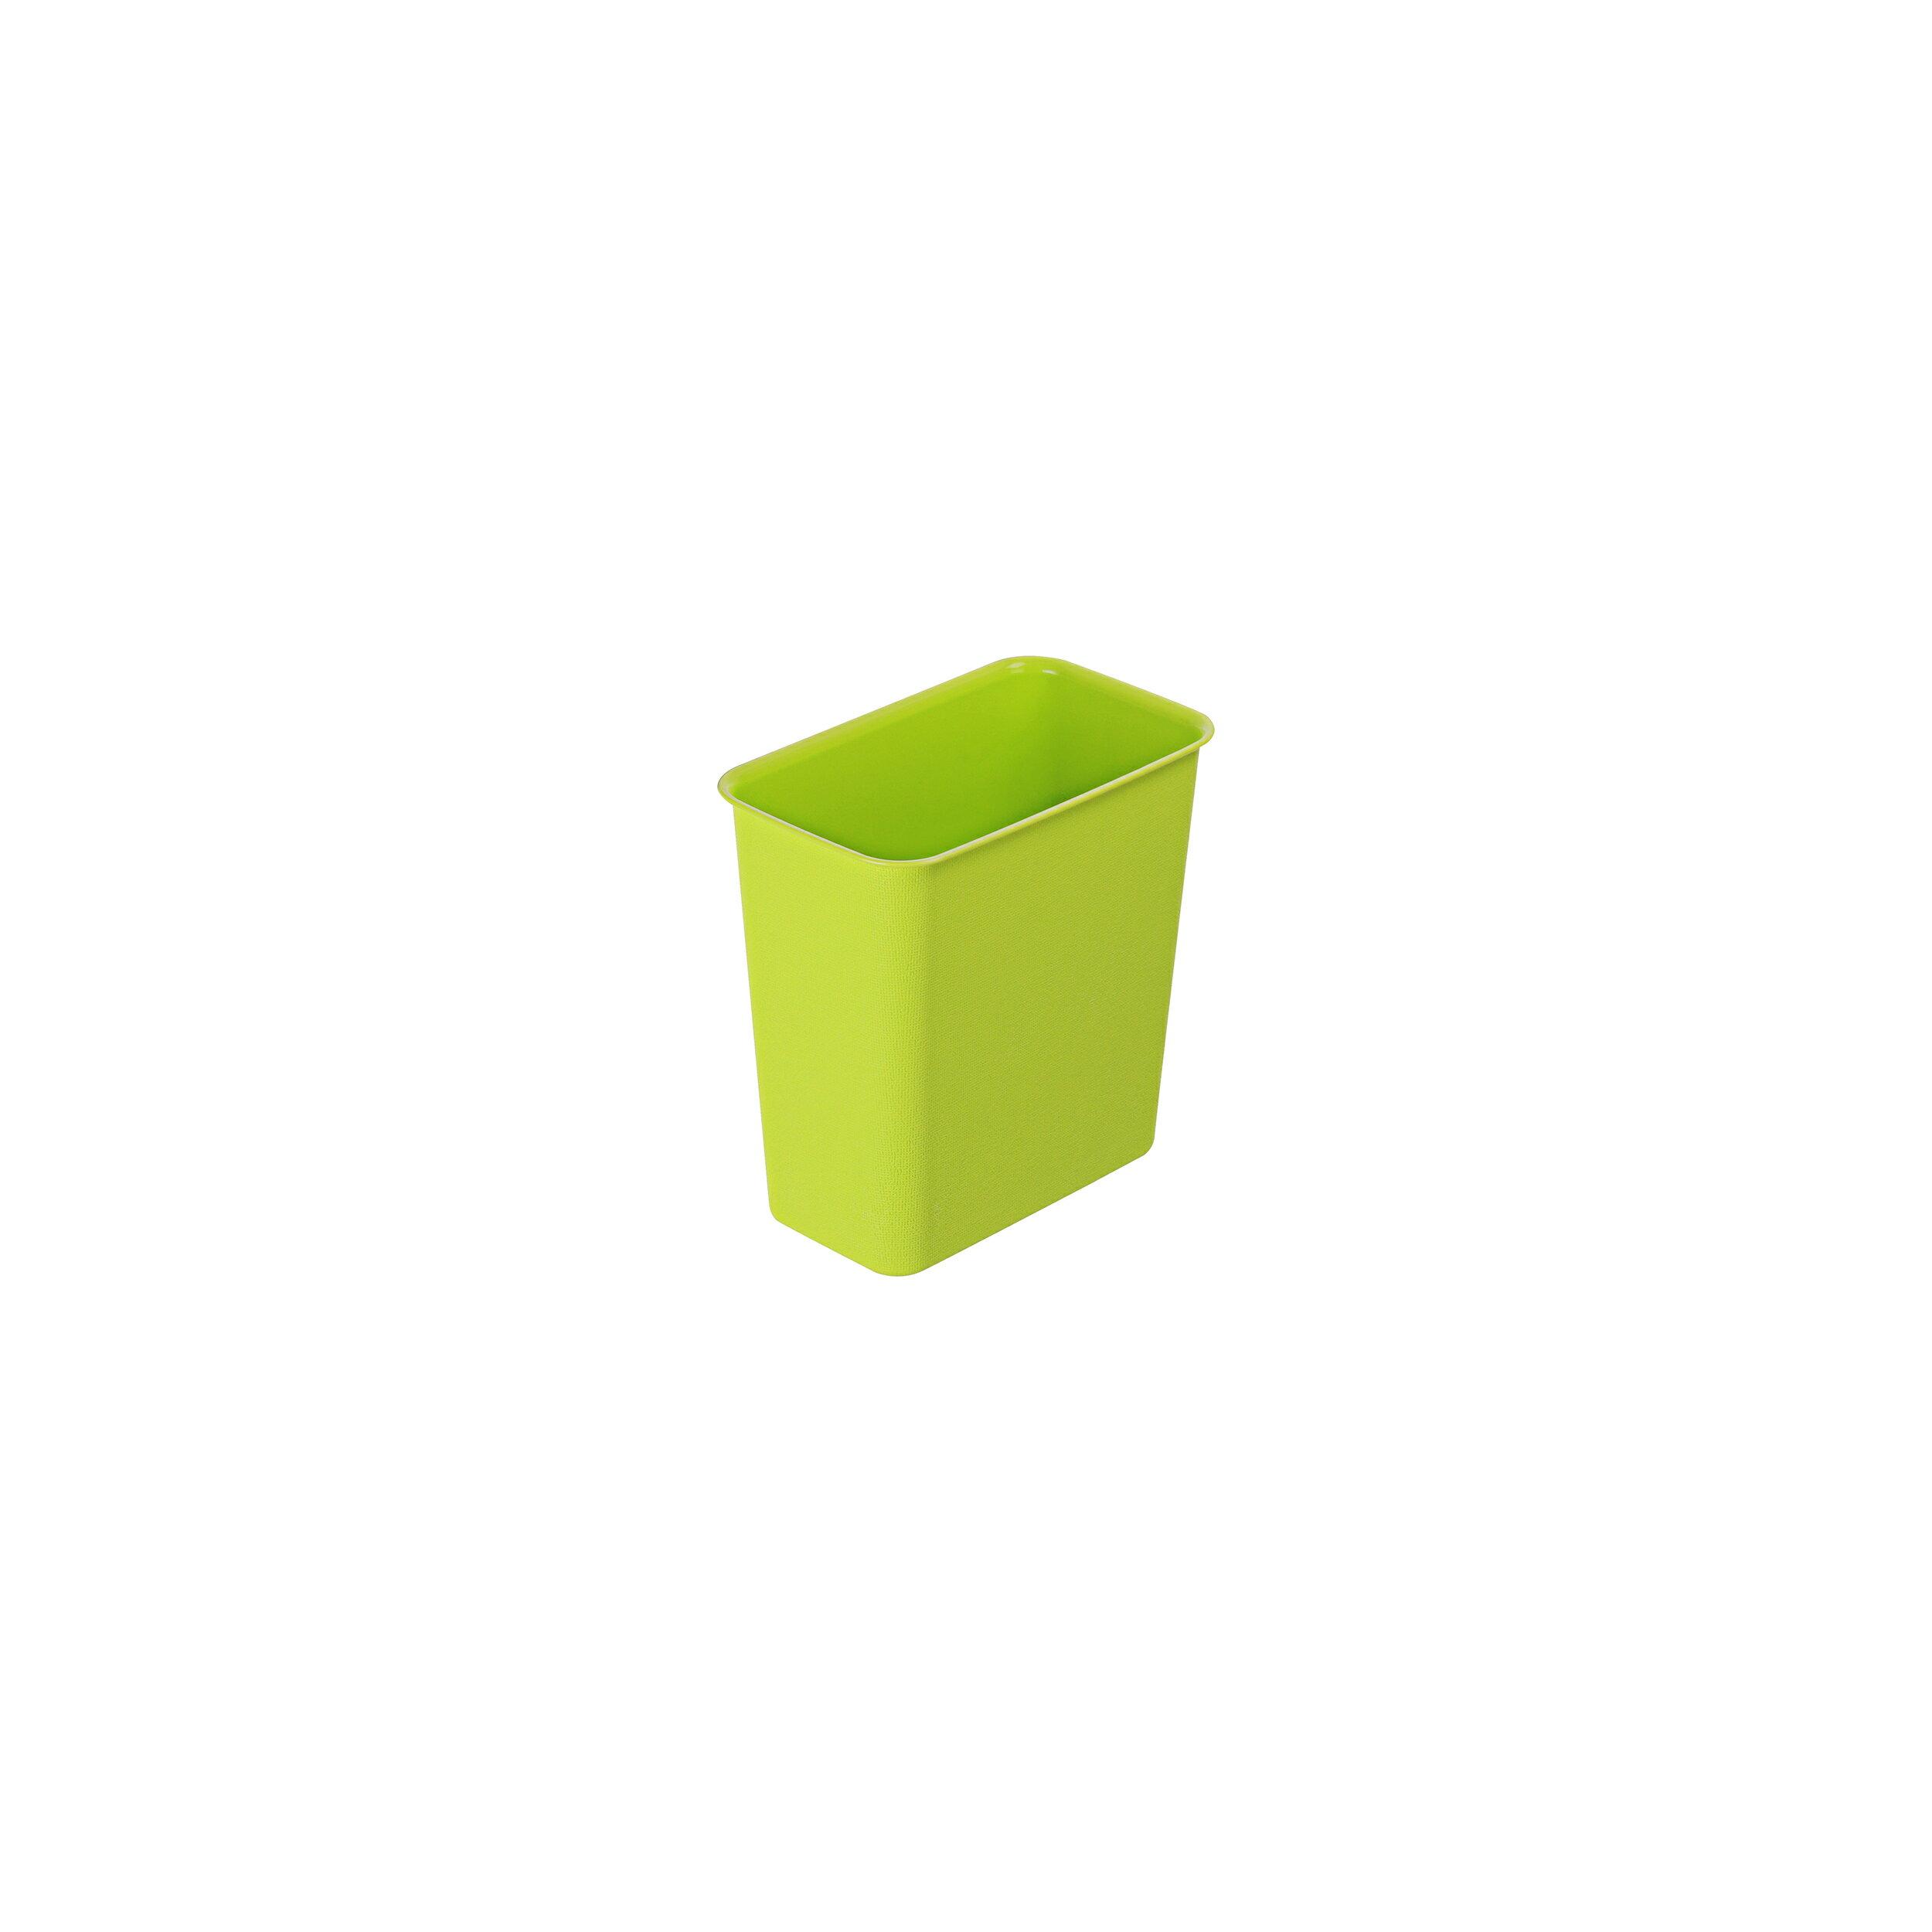 KEYWAY聯府 MIT 小彩虹垃圾桶(長型)C9303(顏色隨機出貨) 3